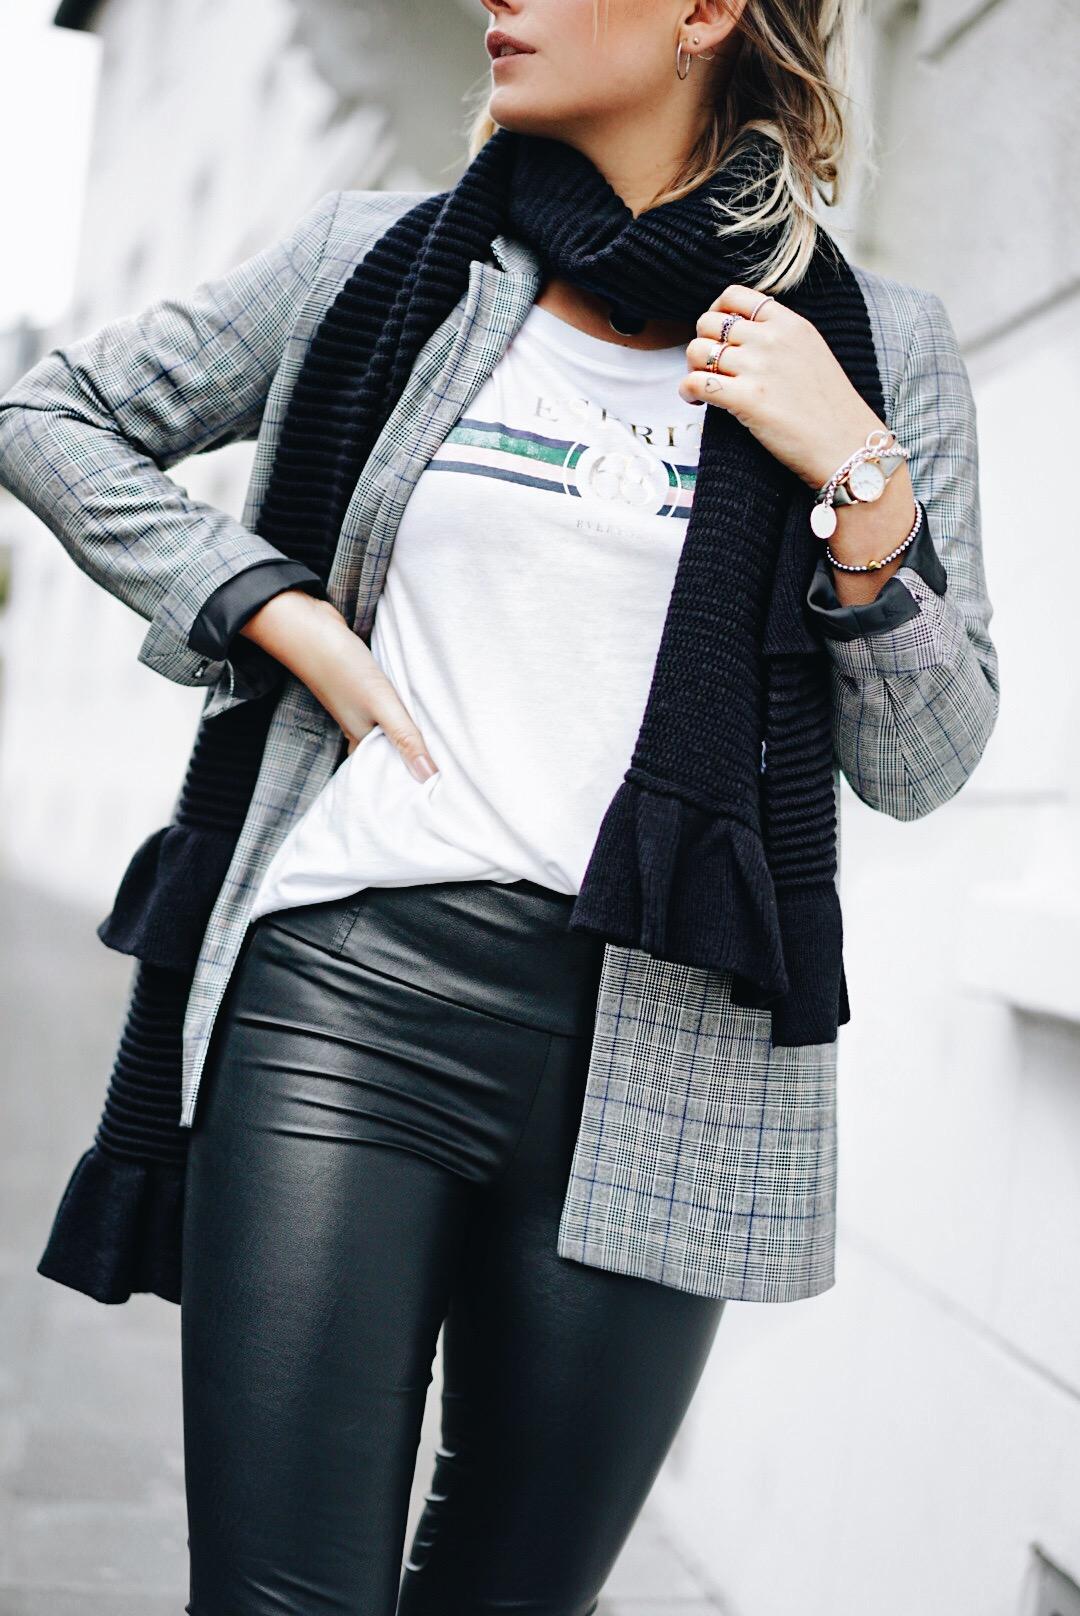 3-looks-esprit-sporty-tshirt-lederleggings-karoblazer-fashionforffranzy-ffranzy-fashionblogger-modeblogger-koeln-cologne-lifestyleblogger-deutschland